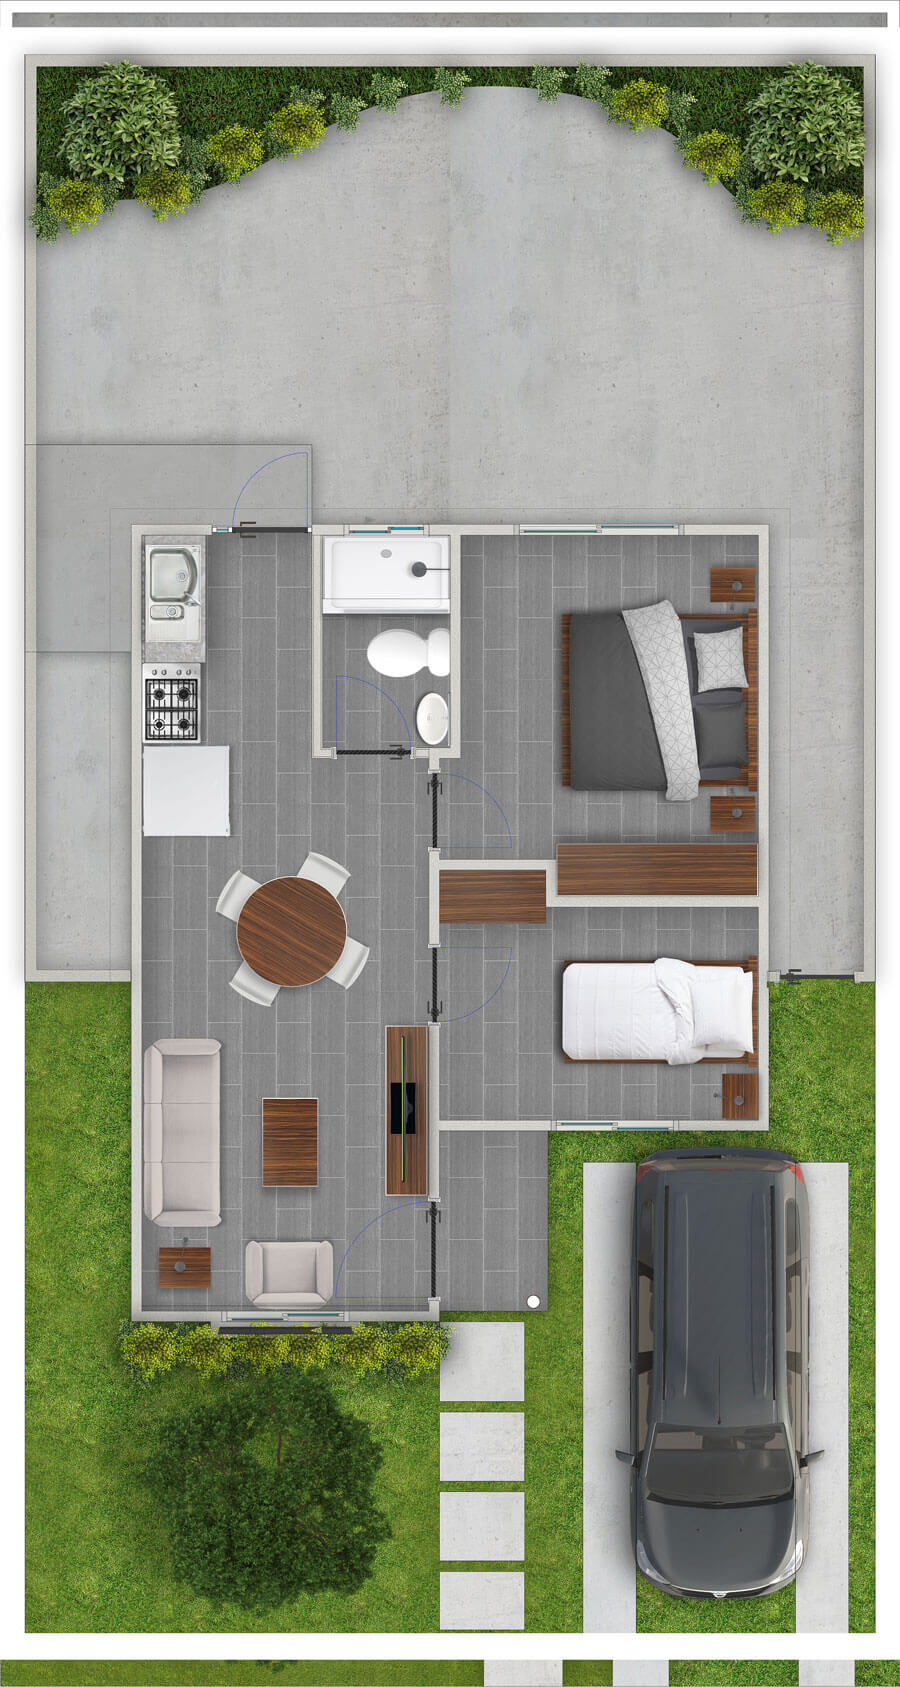 galilea-inmobiliaria-constructora-ecuador-render-interior-casa-modelo-margarita-40-m2